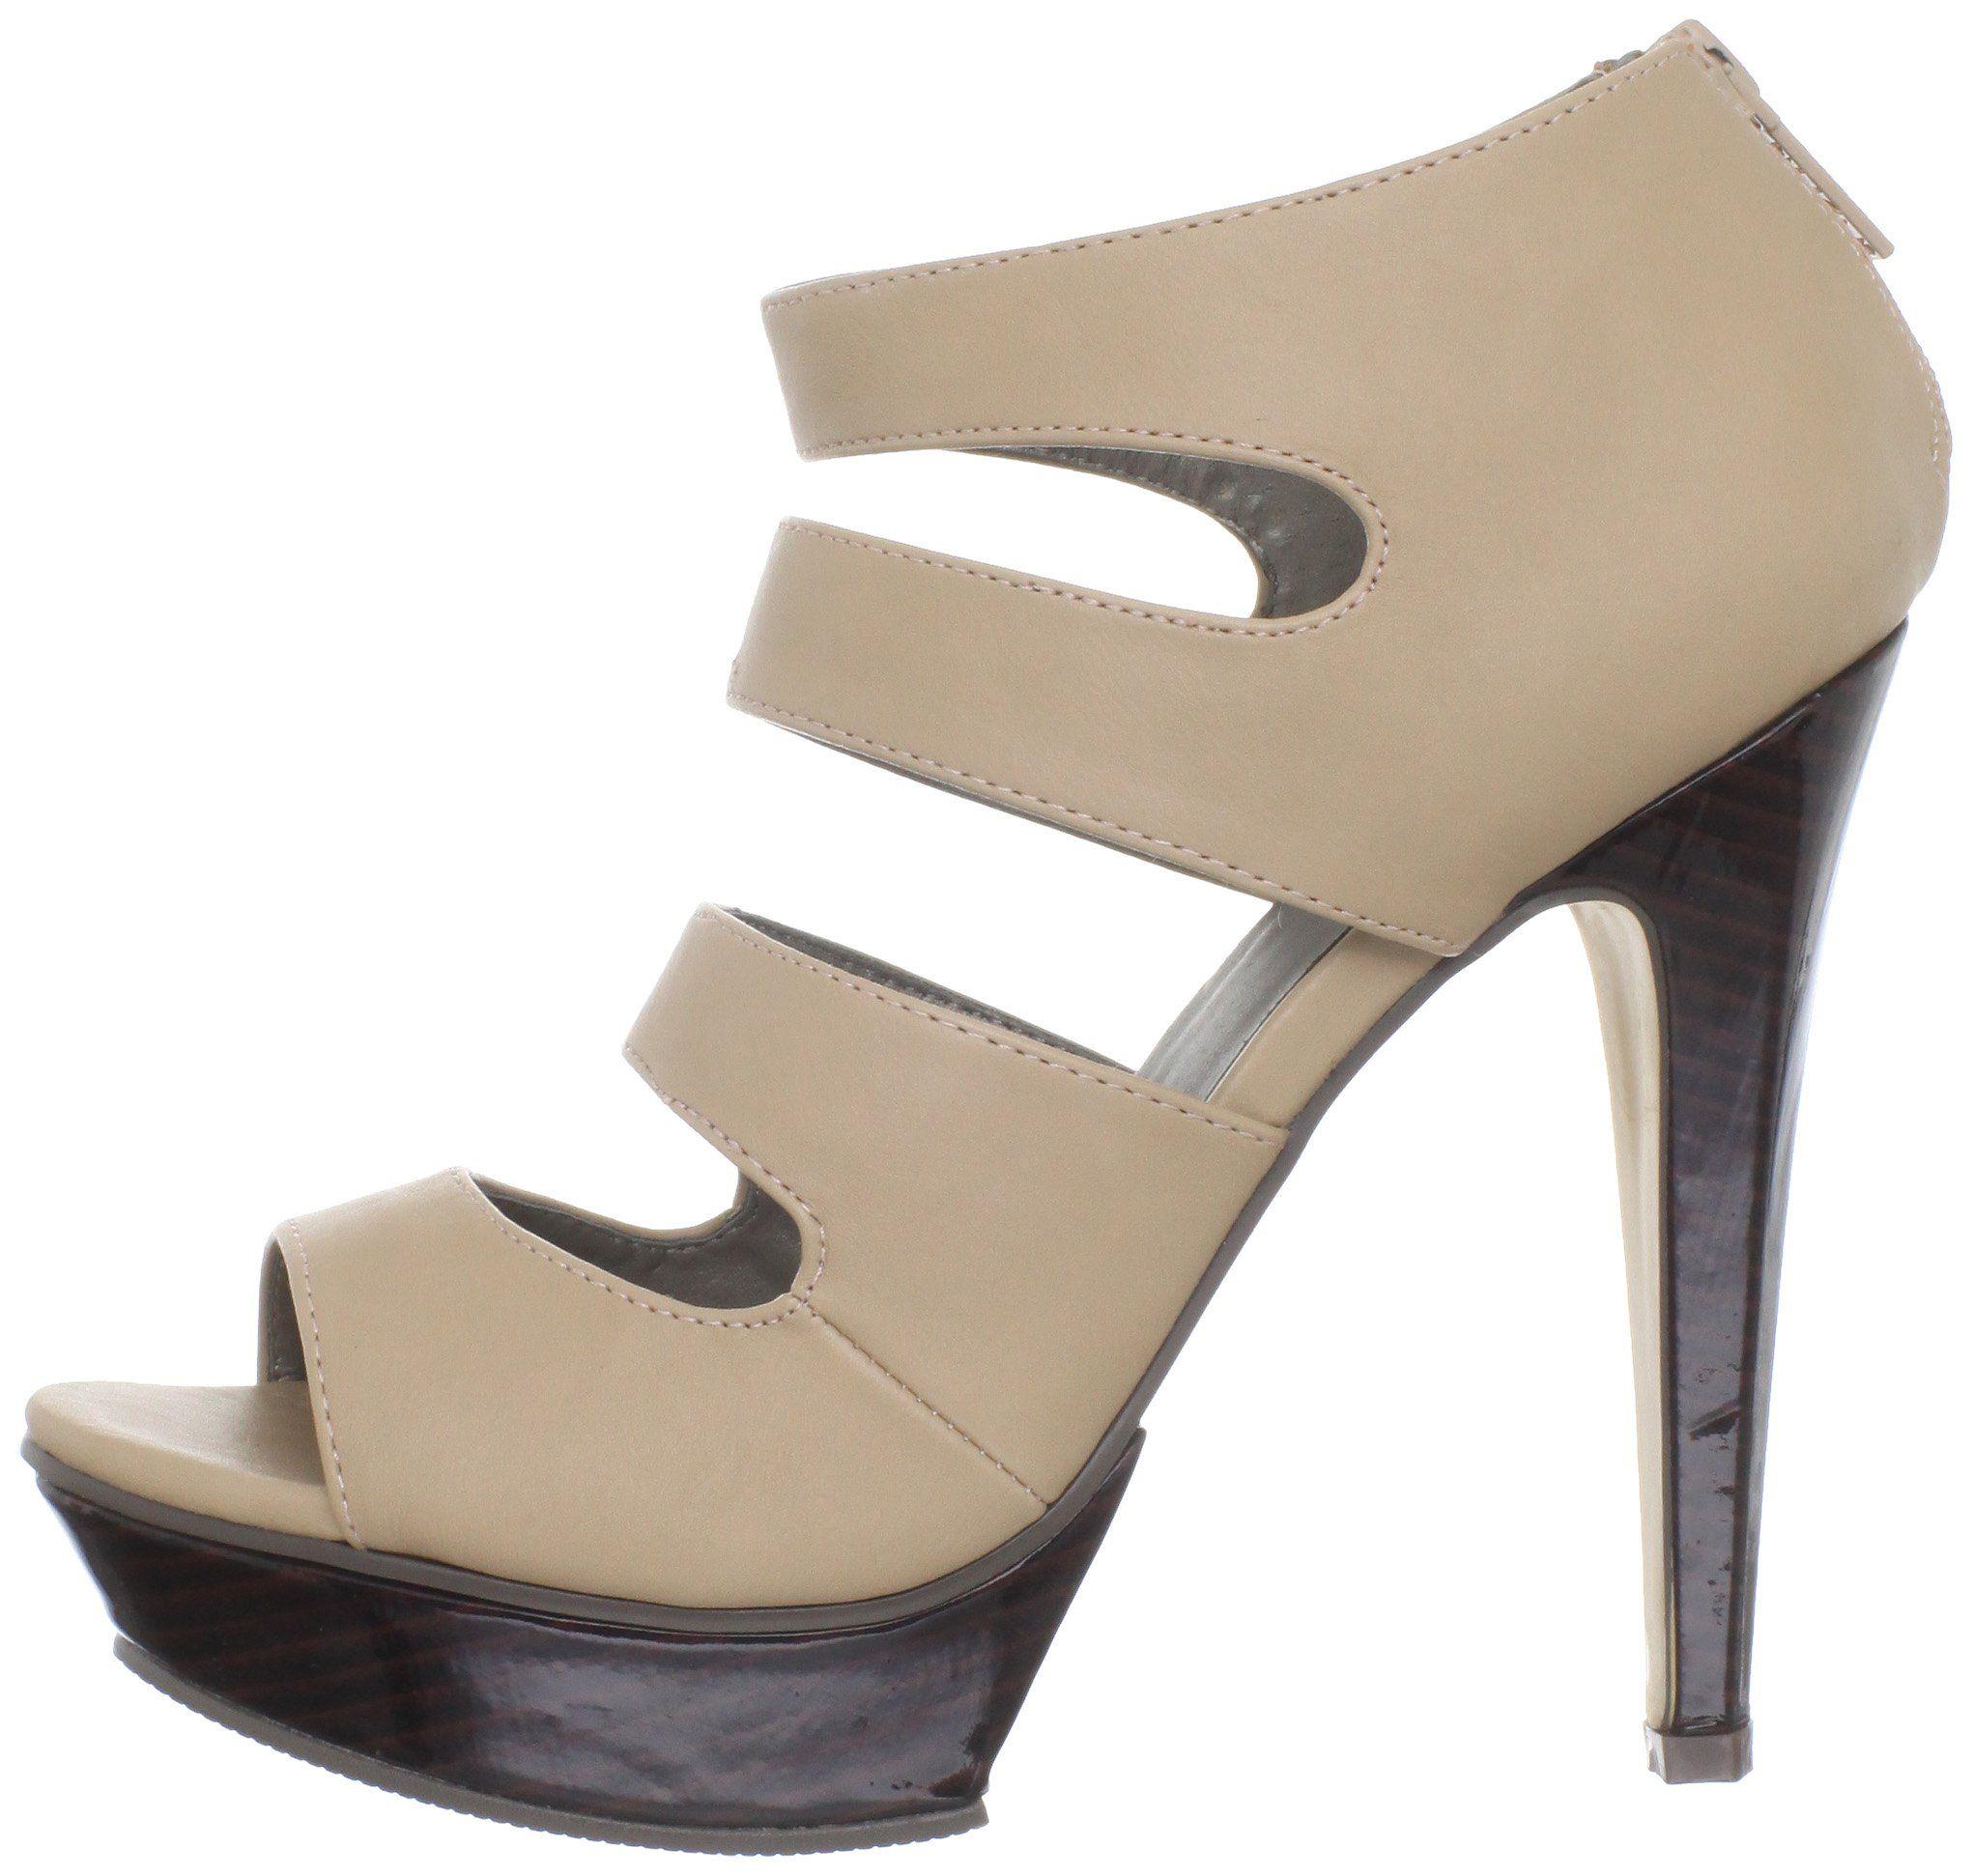 Michael antonio, Women, Platform sandals